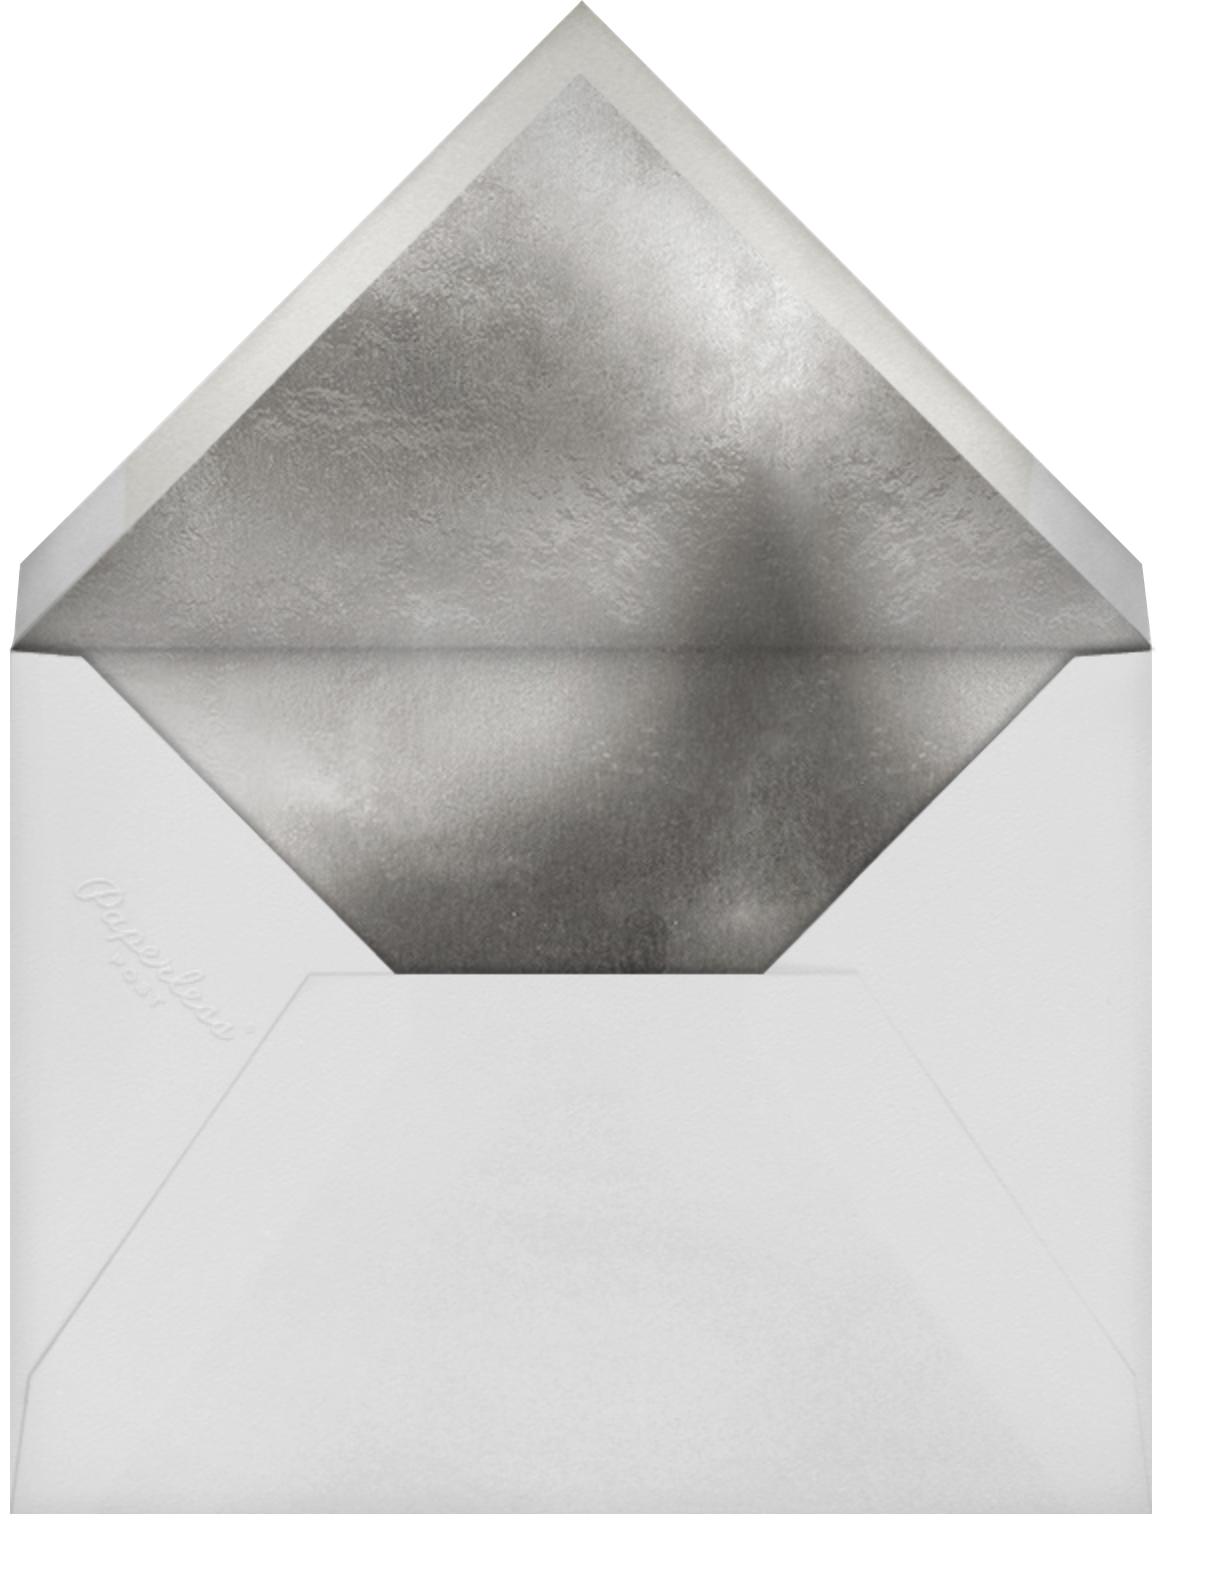 Confetti Caps - Silver - Paperless Post - Envelope